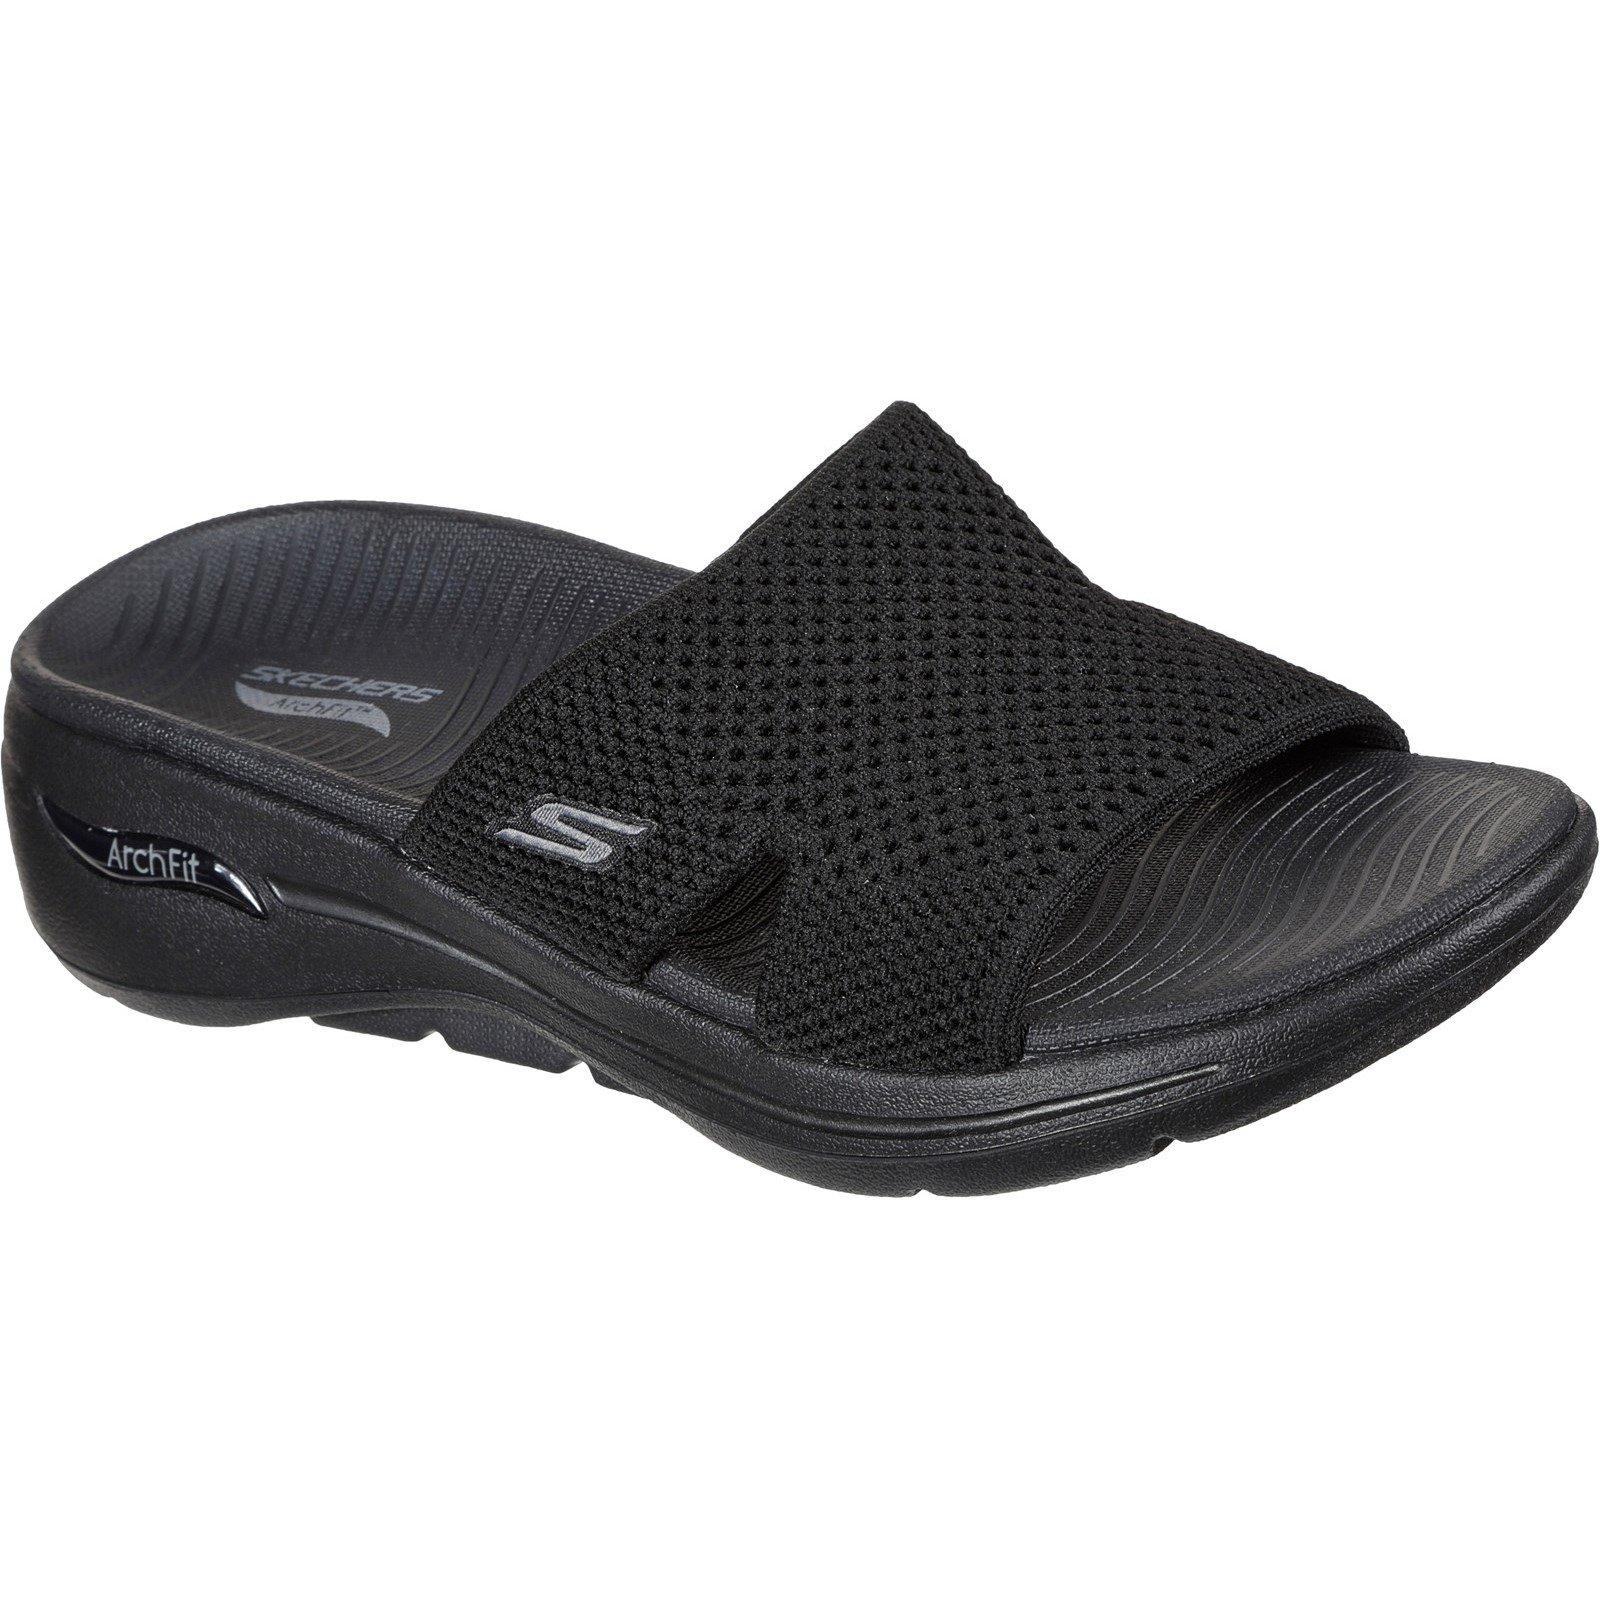 Skechers Women's Go Walk Arch Fit Worthy Summer Sandal Various Colours 32152 - Black 6